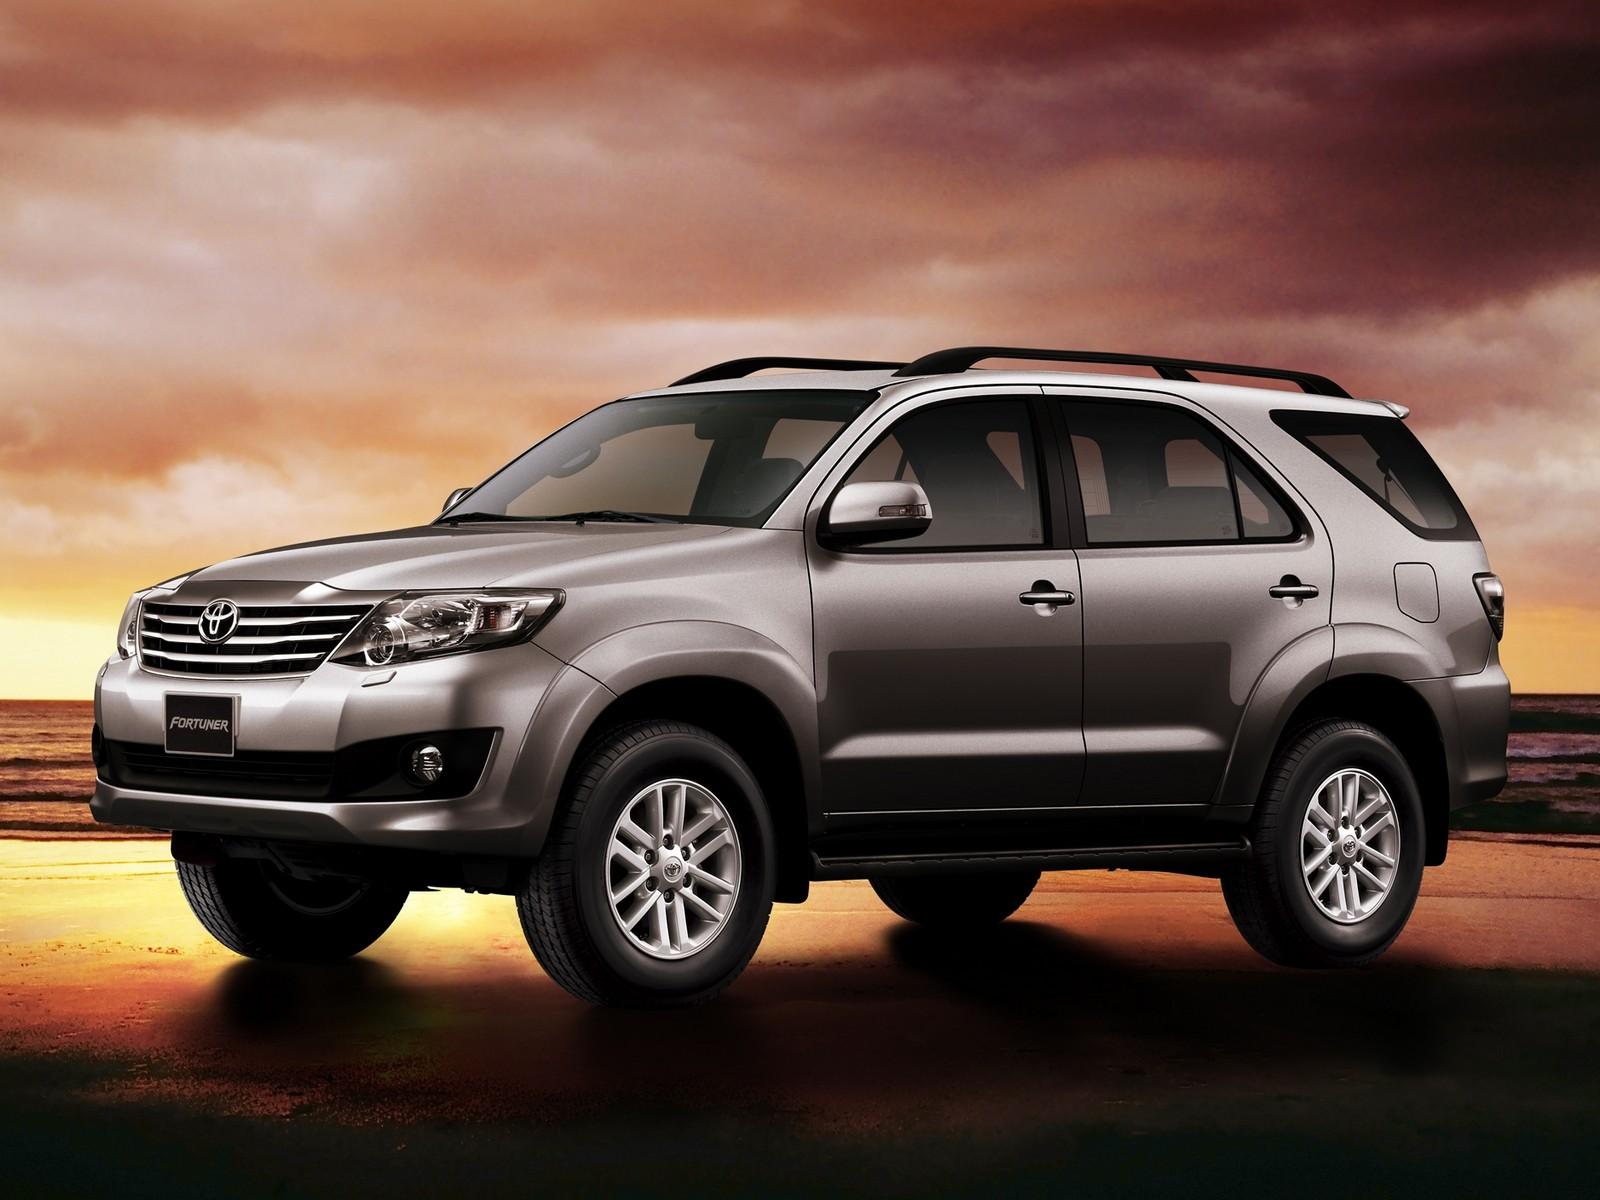 Toyota Fortuner Hd Wallpaper - Toyota Fortuner 2015 Hd , HD Wallpaper & Backgrounds